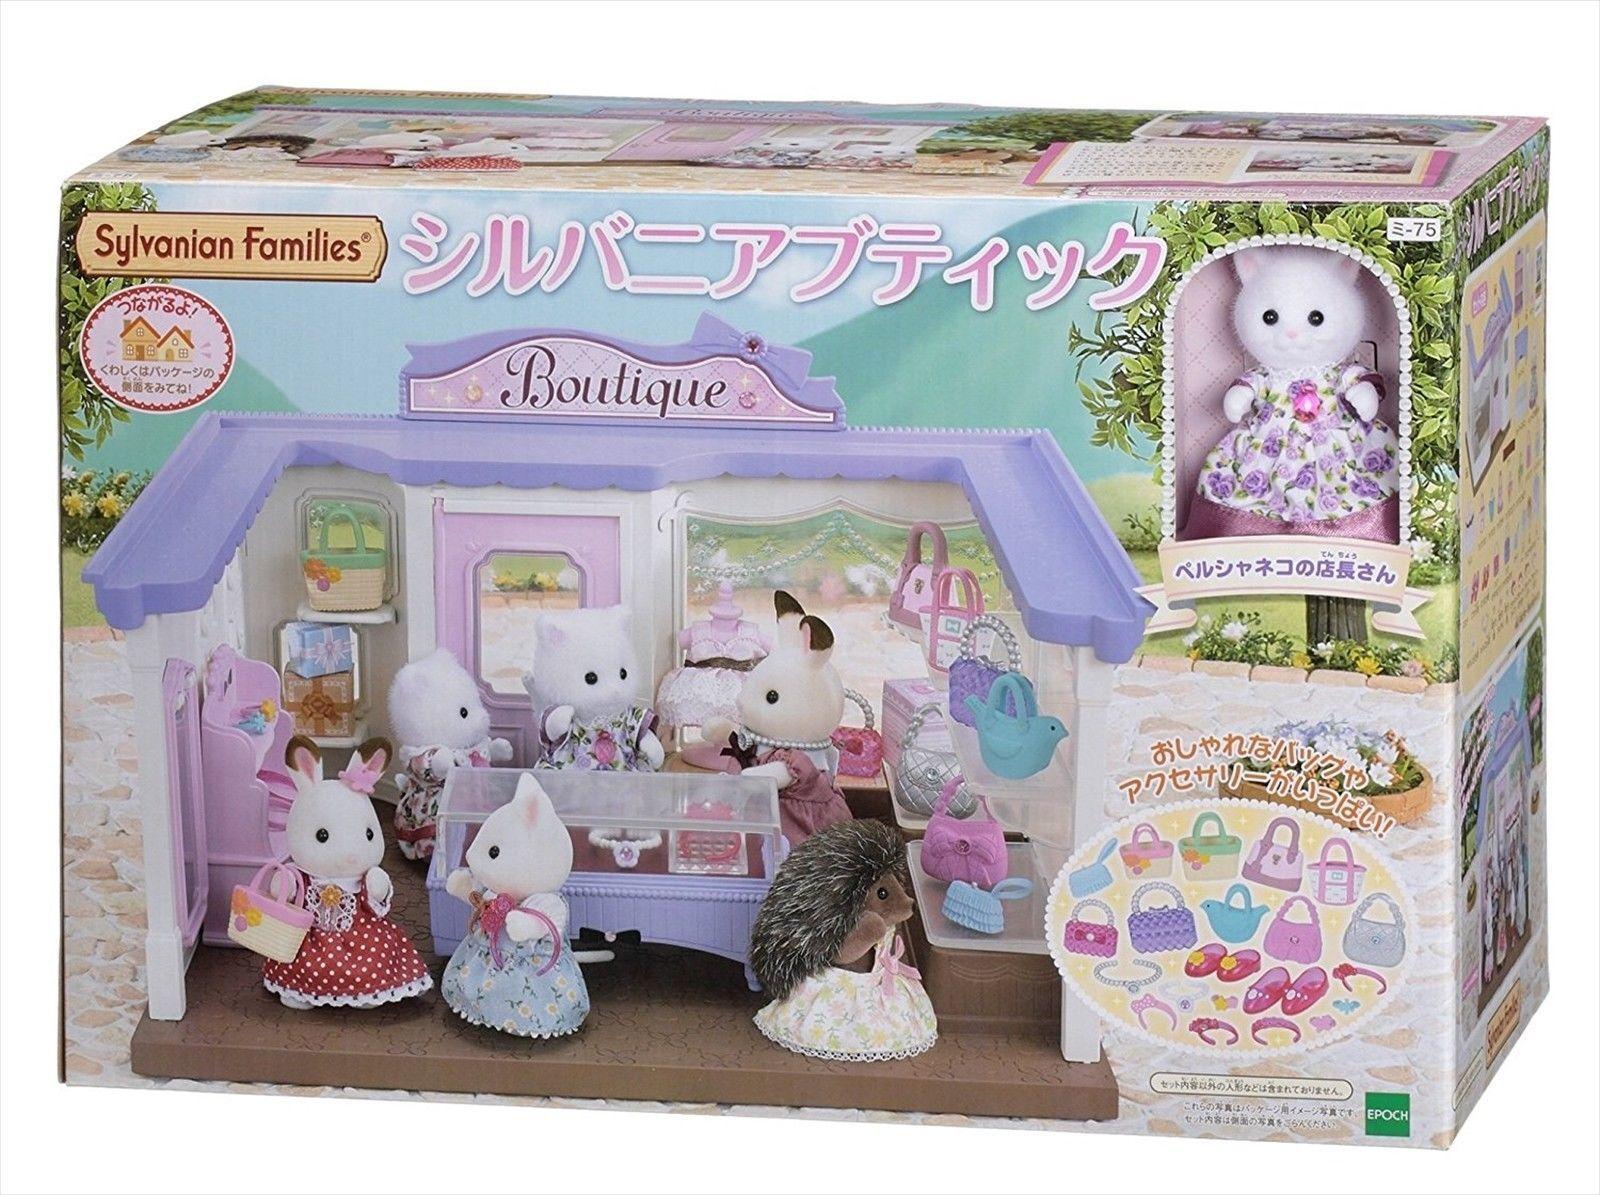 Sylvanian Families Mi-75 Silvanian Boutique Set with a Persian Cat Clerk